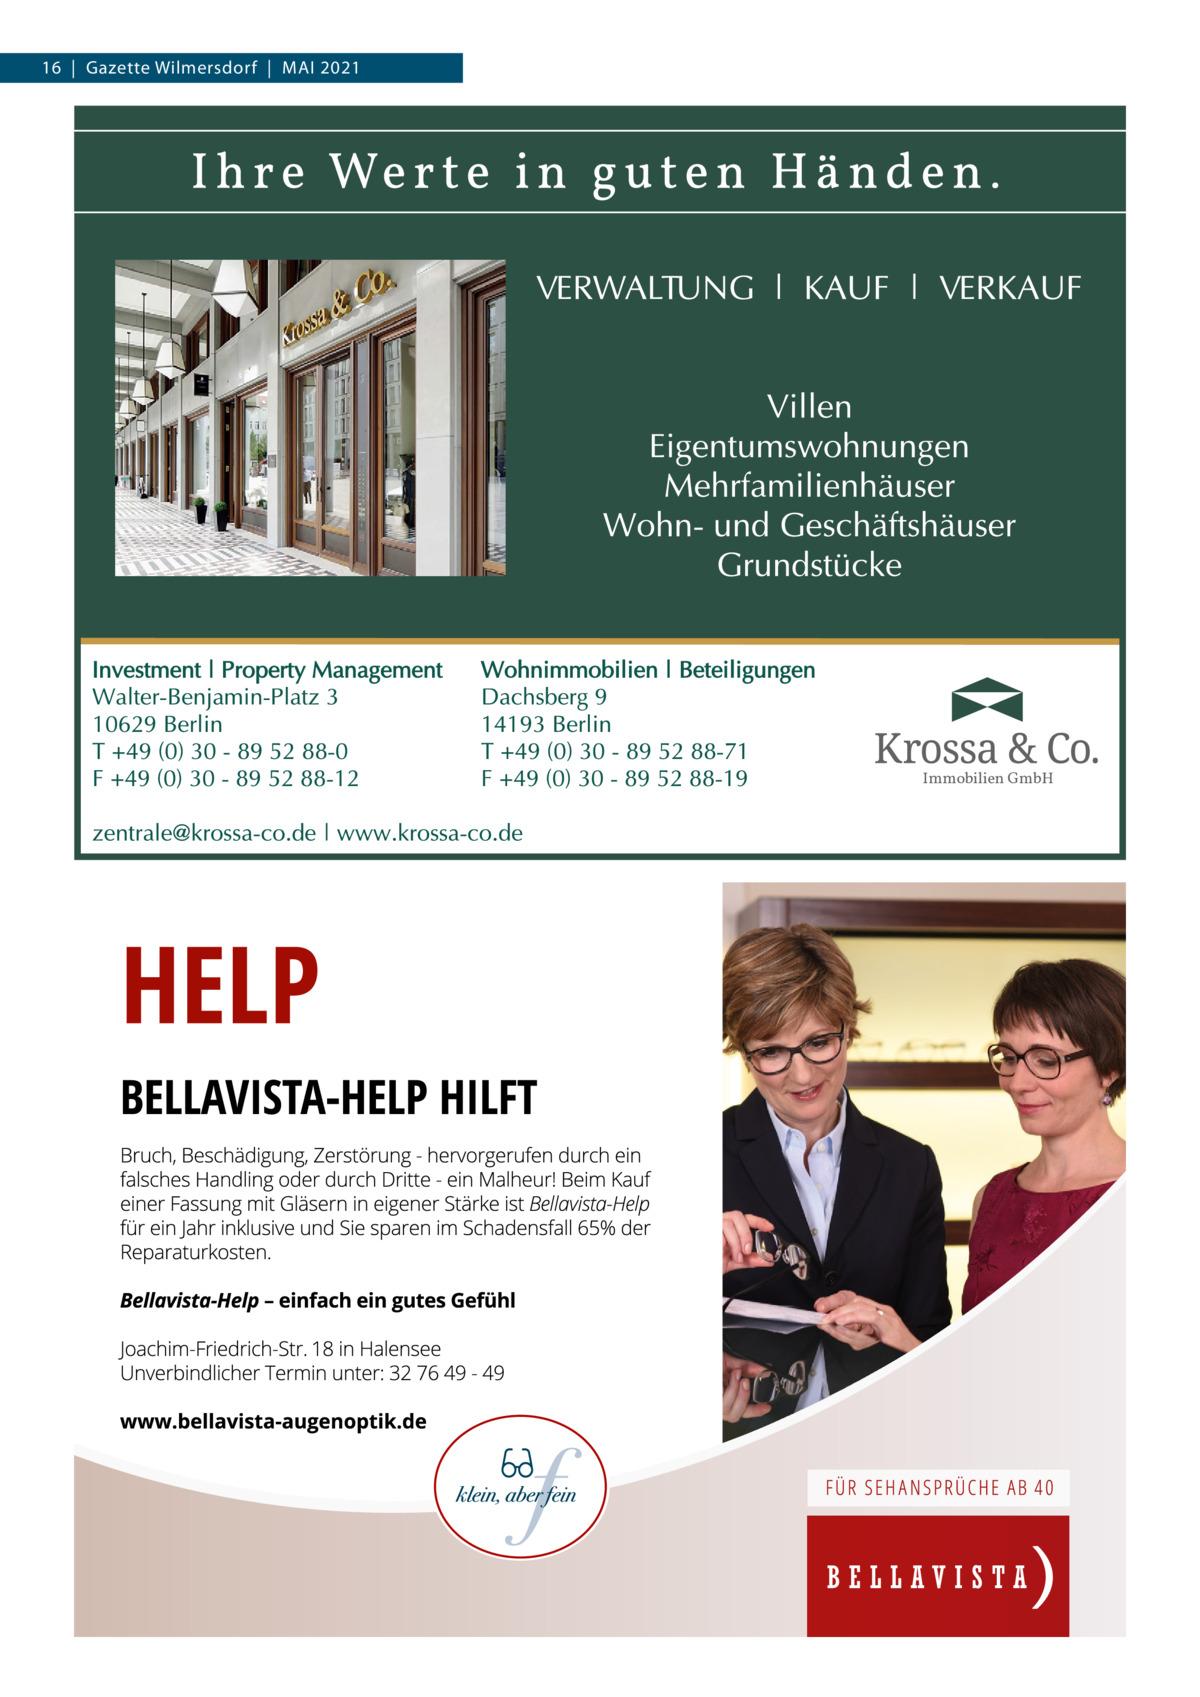 16 Gazette Wilmersdorf Mai 2021  Immobilien GmbH